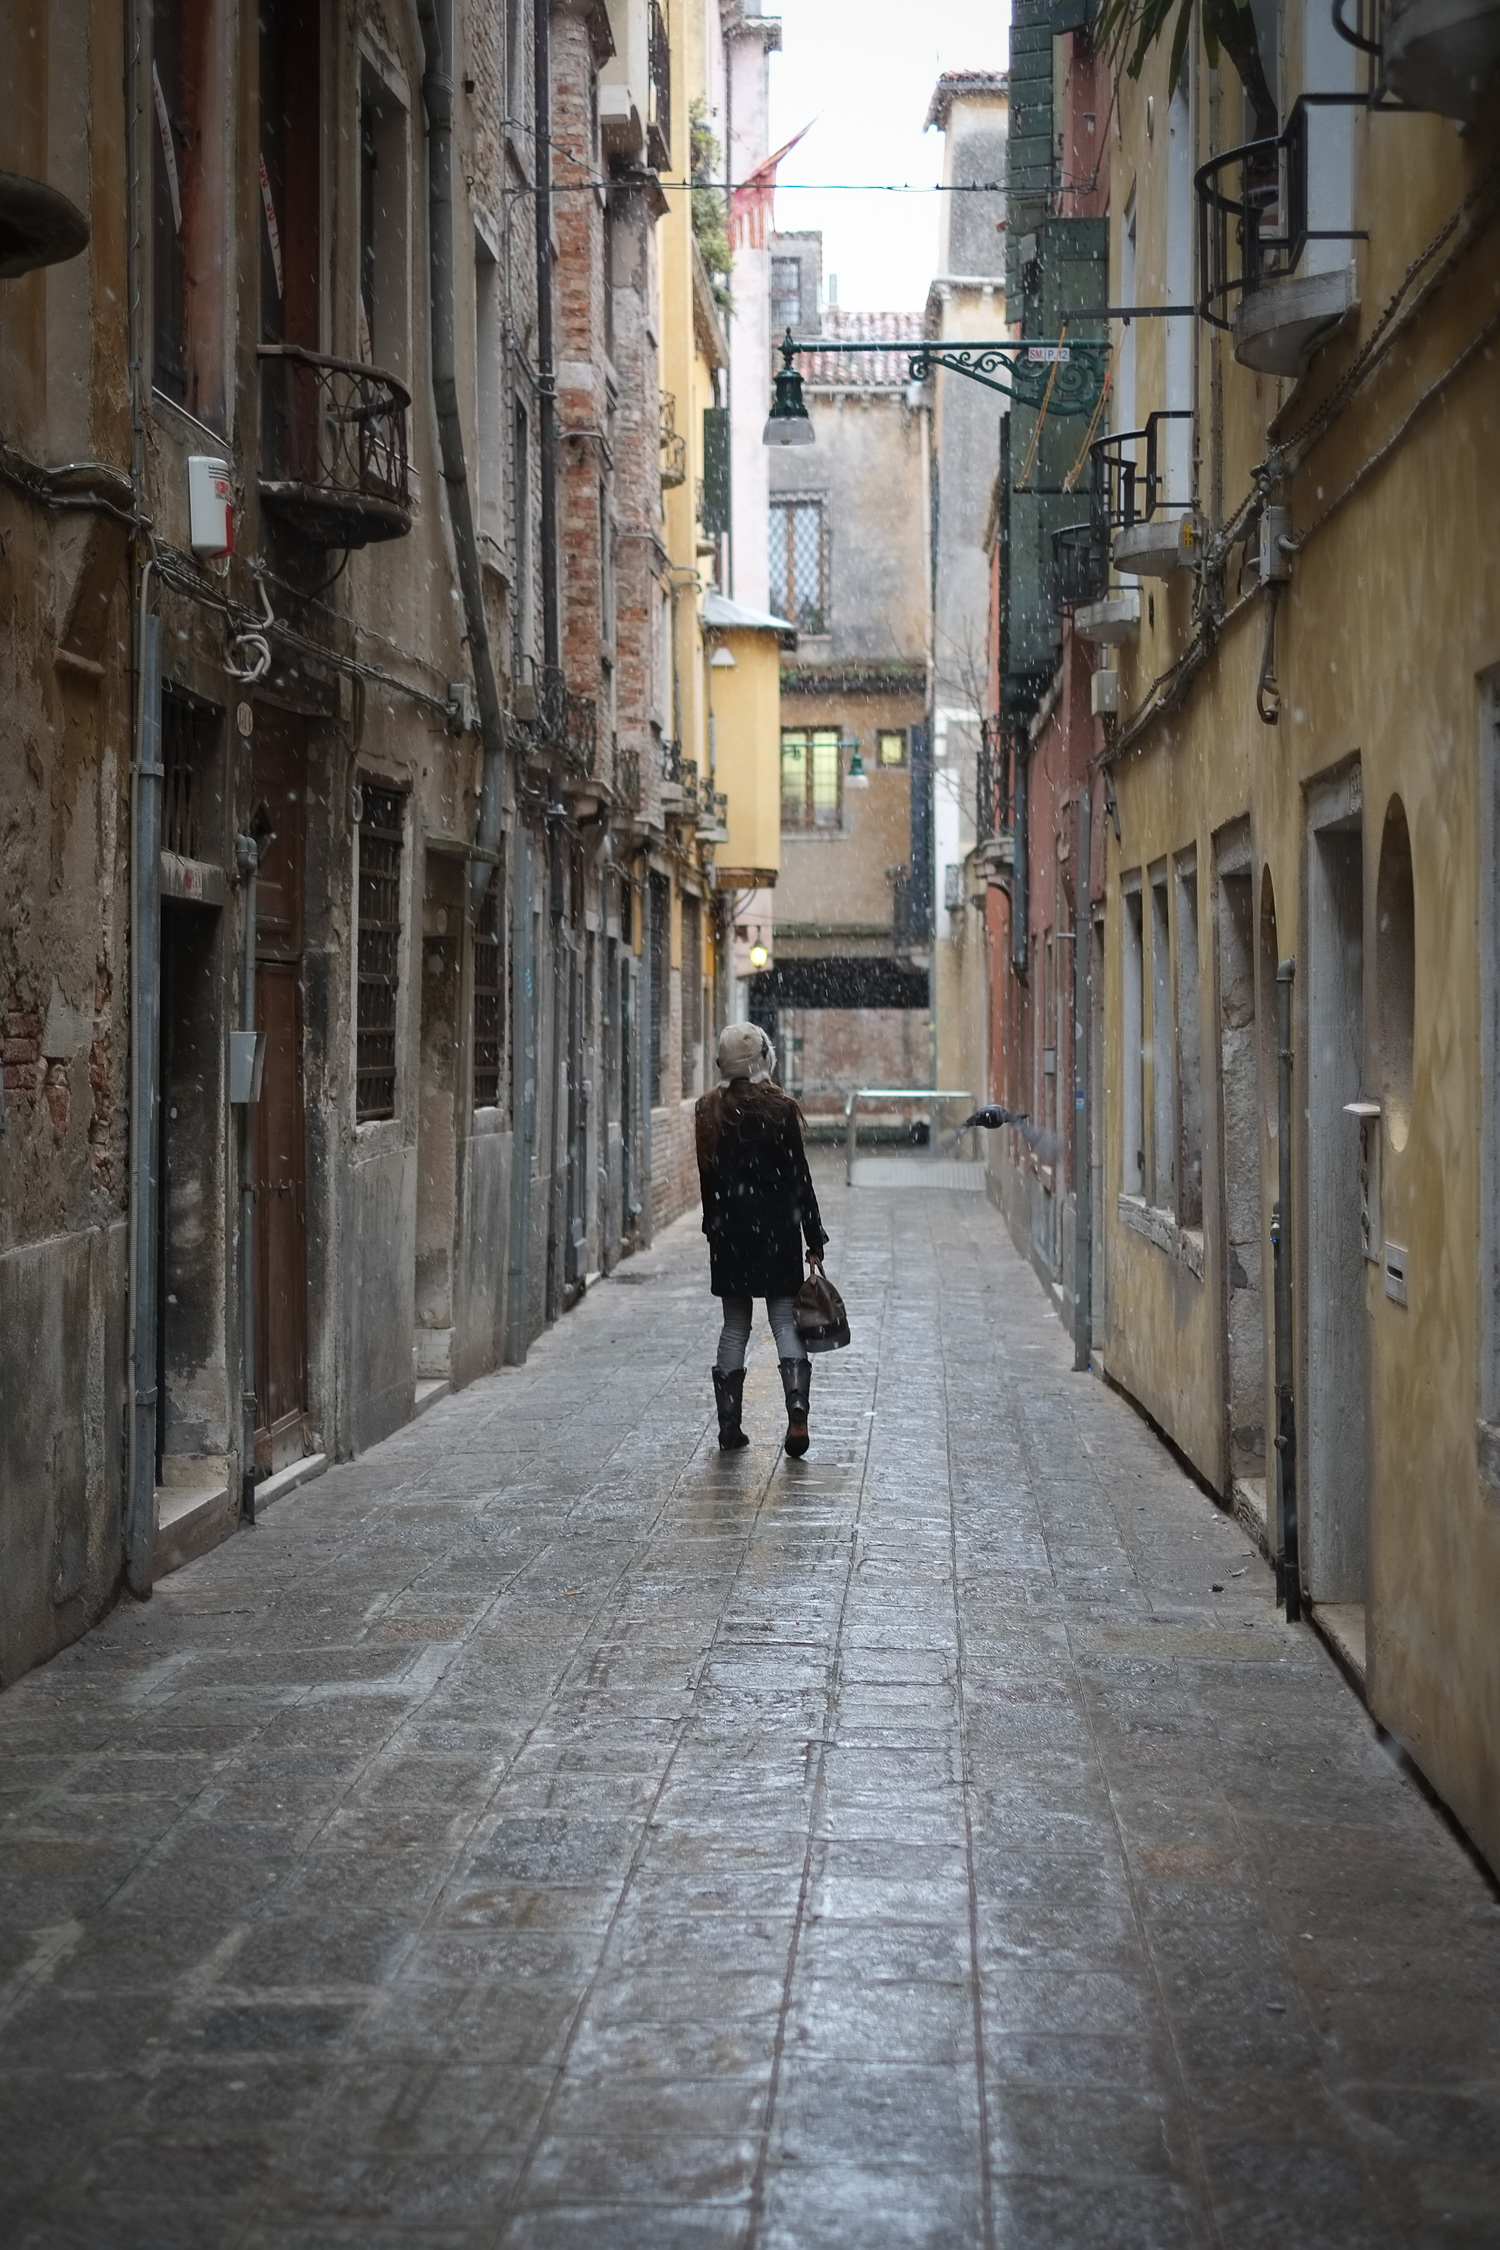 20130221 - Venice (1500) -10.jpg